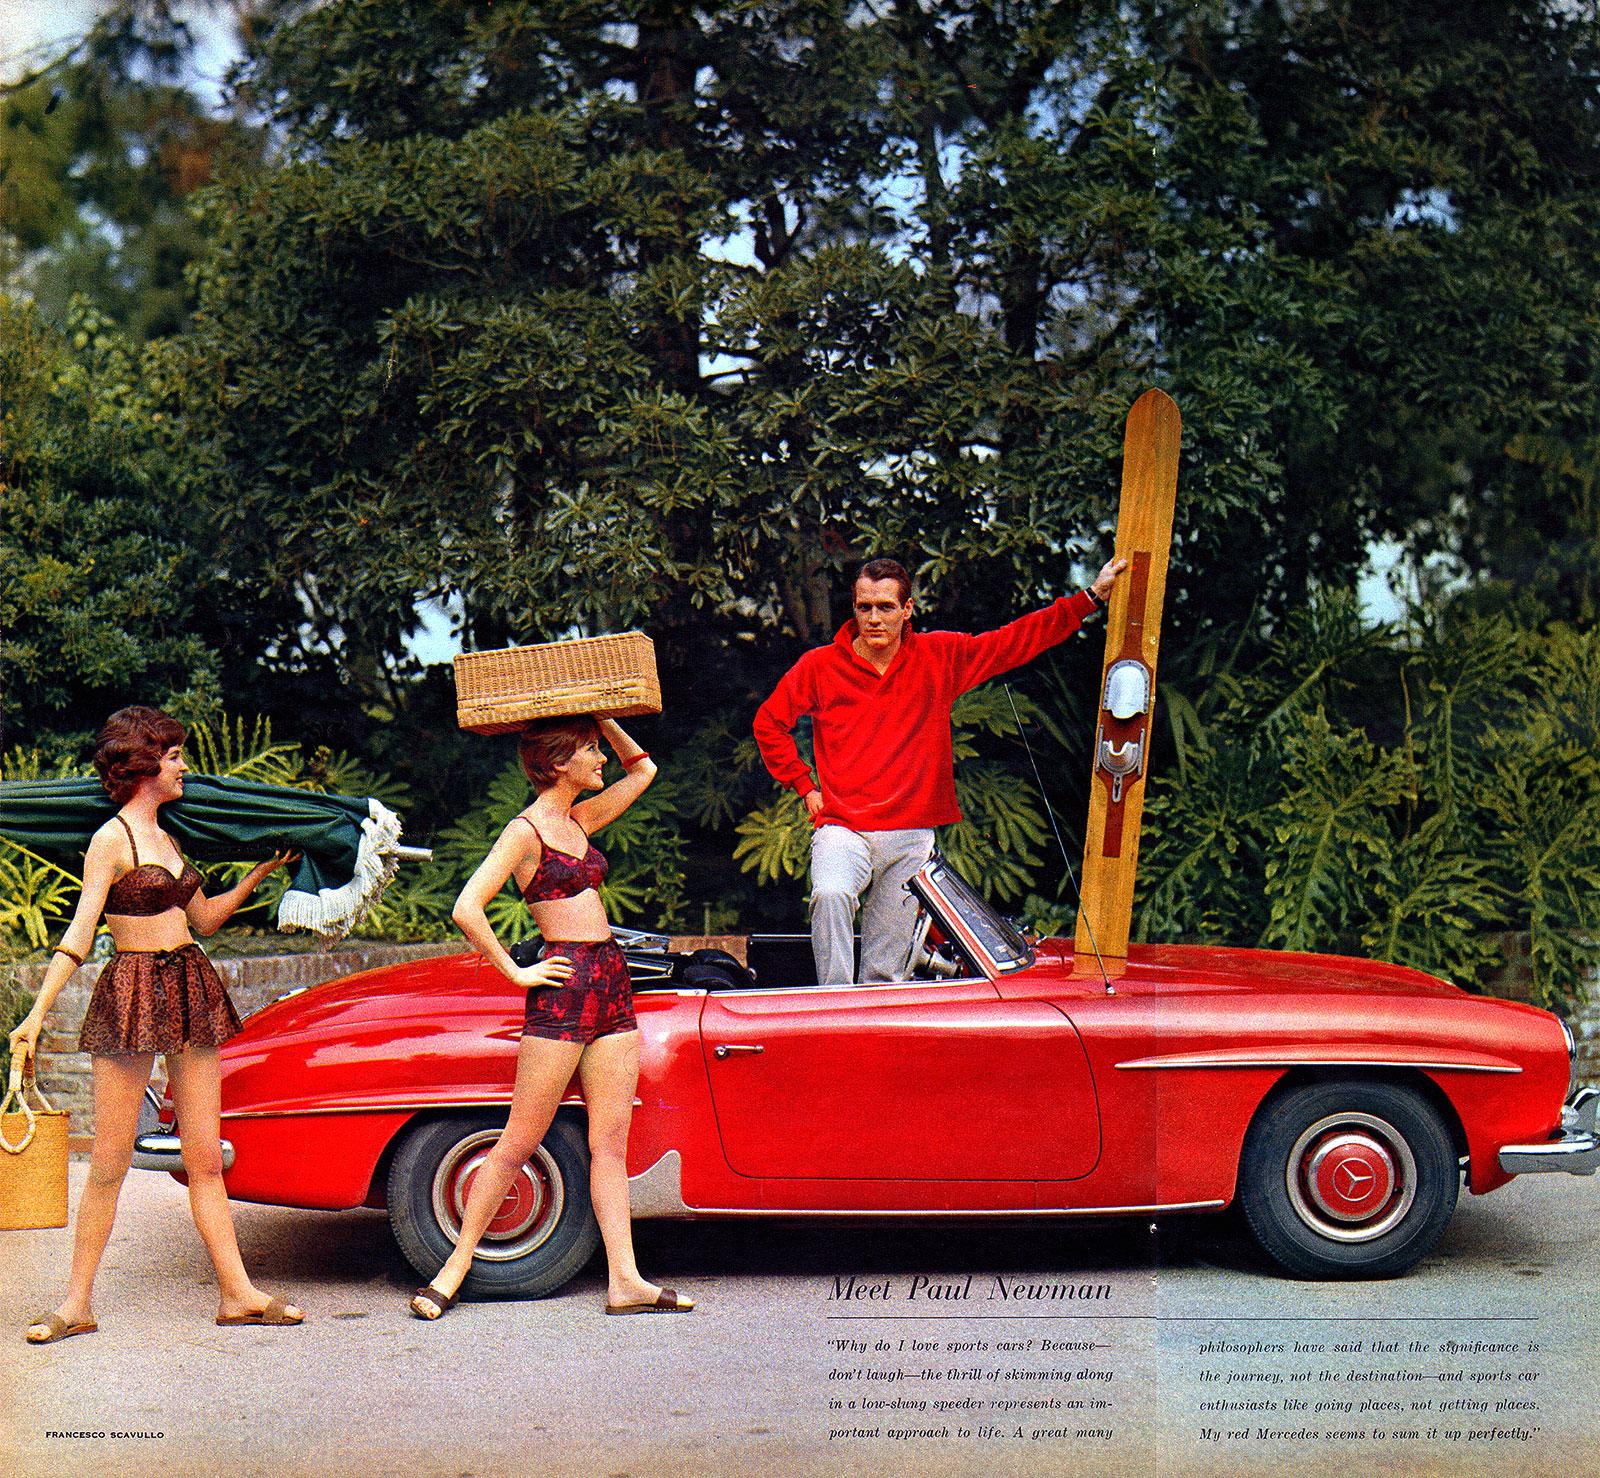 Paul Newman Mercedes-Benz Ad